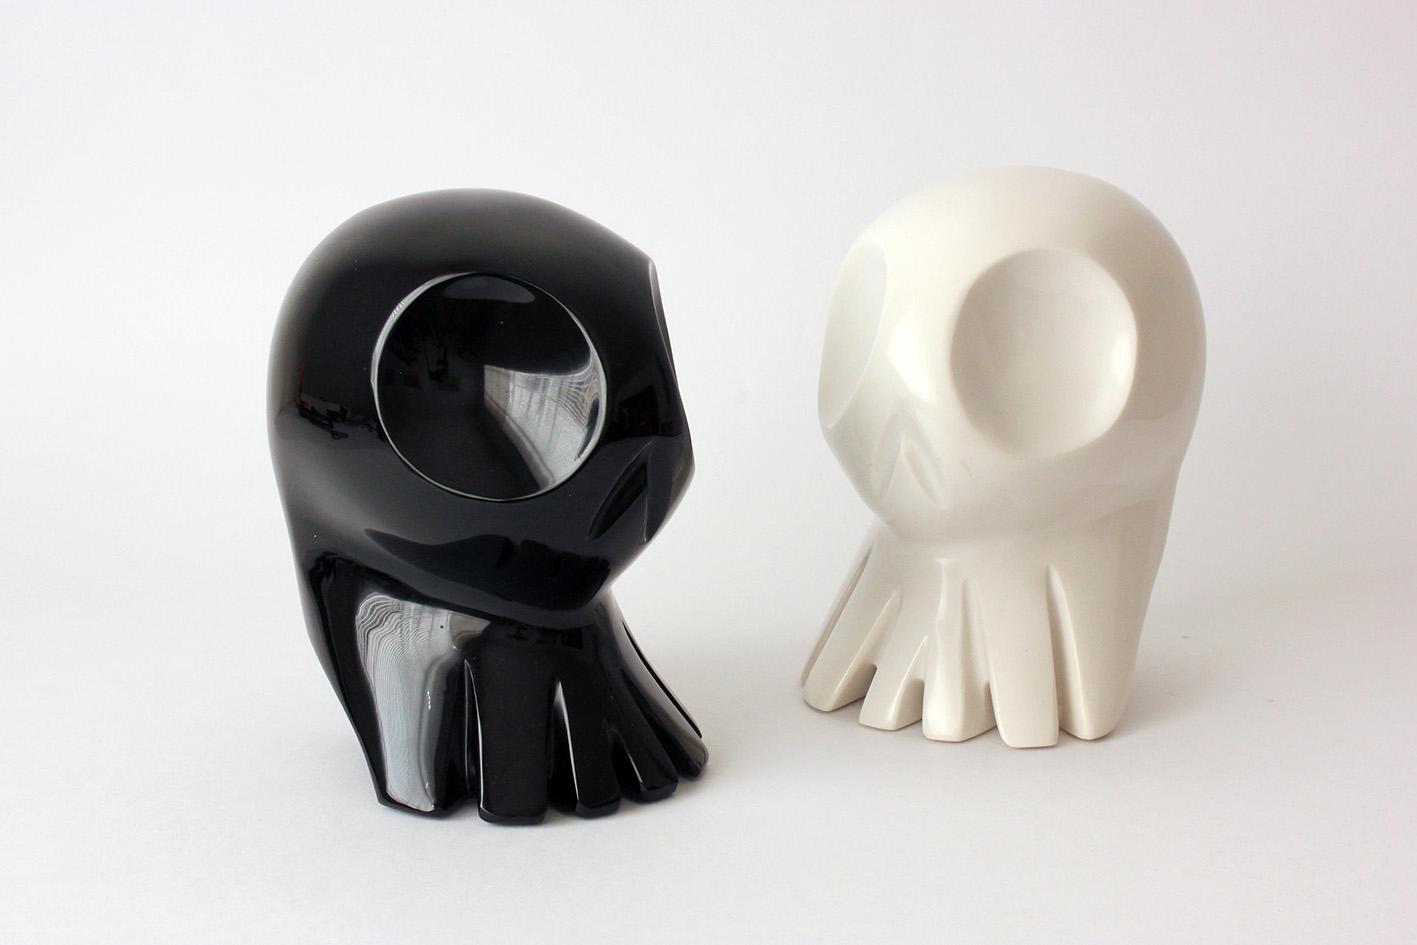 Obsidian-and-resin-Alieno-sculptures3.jpg